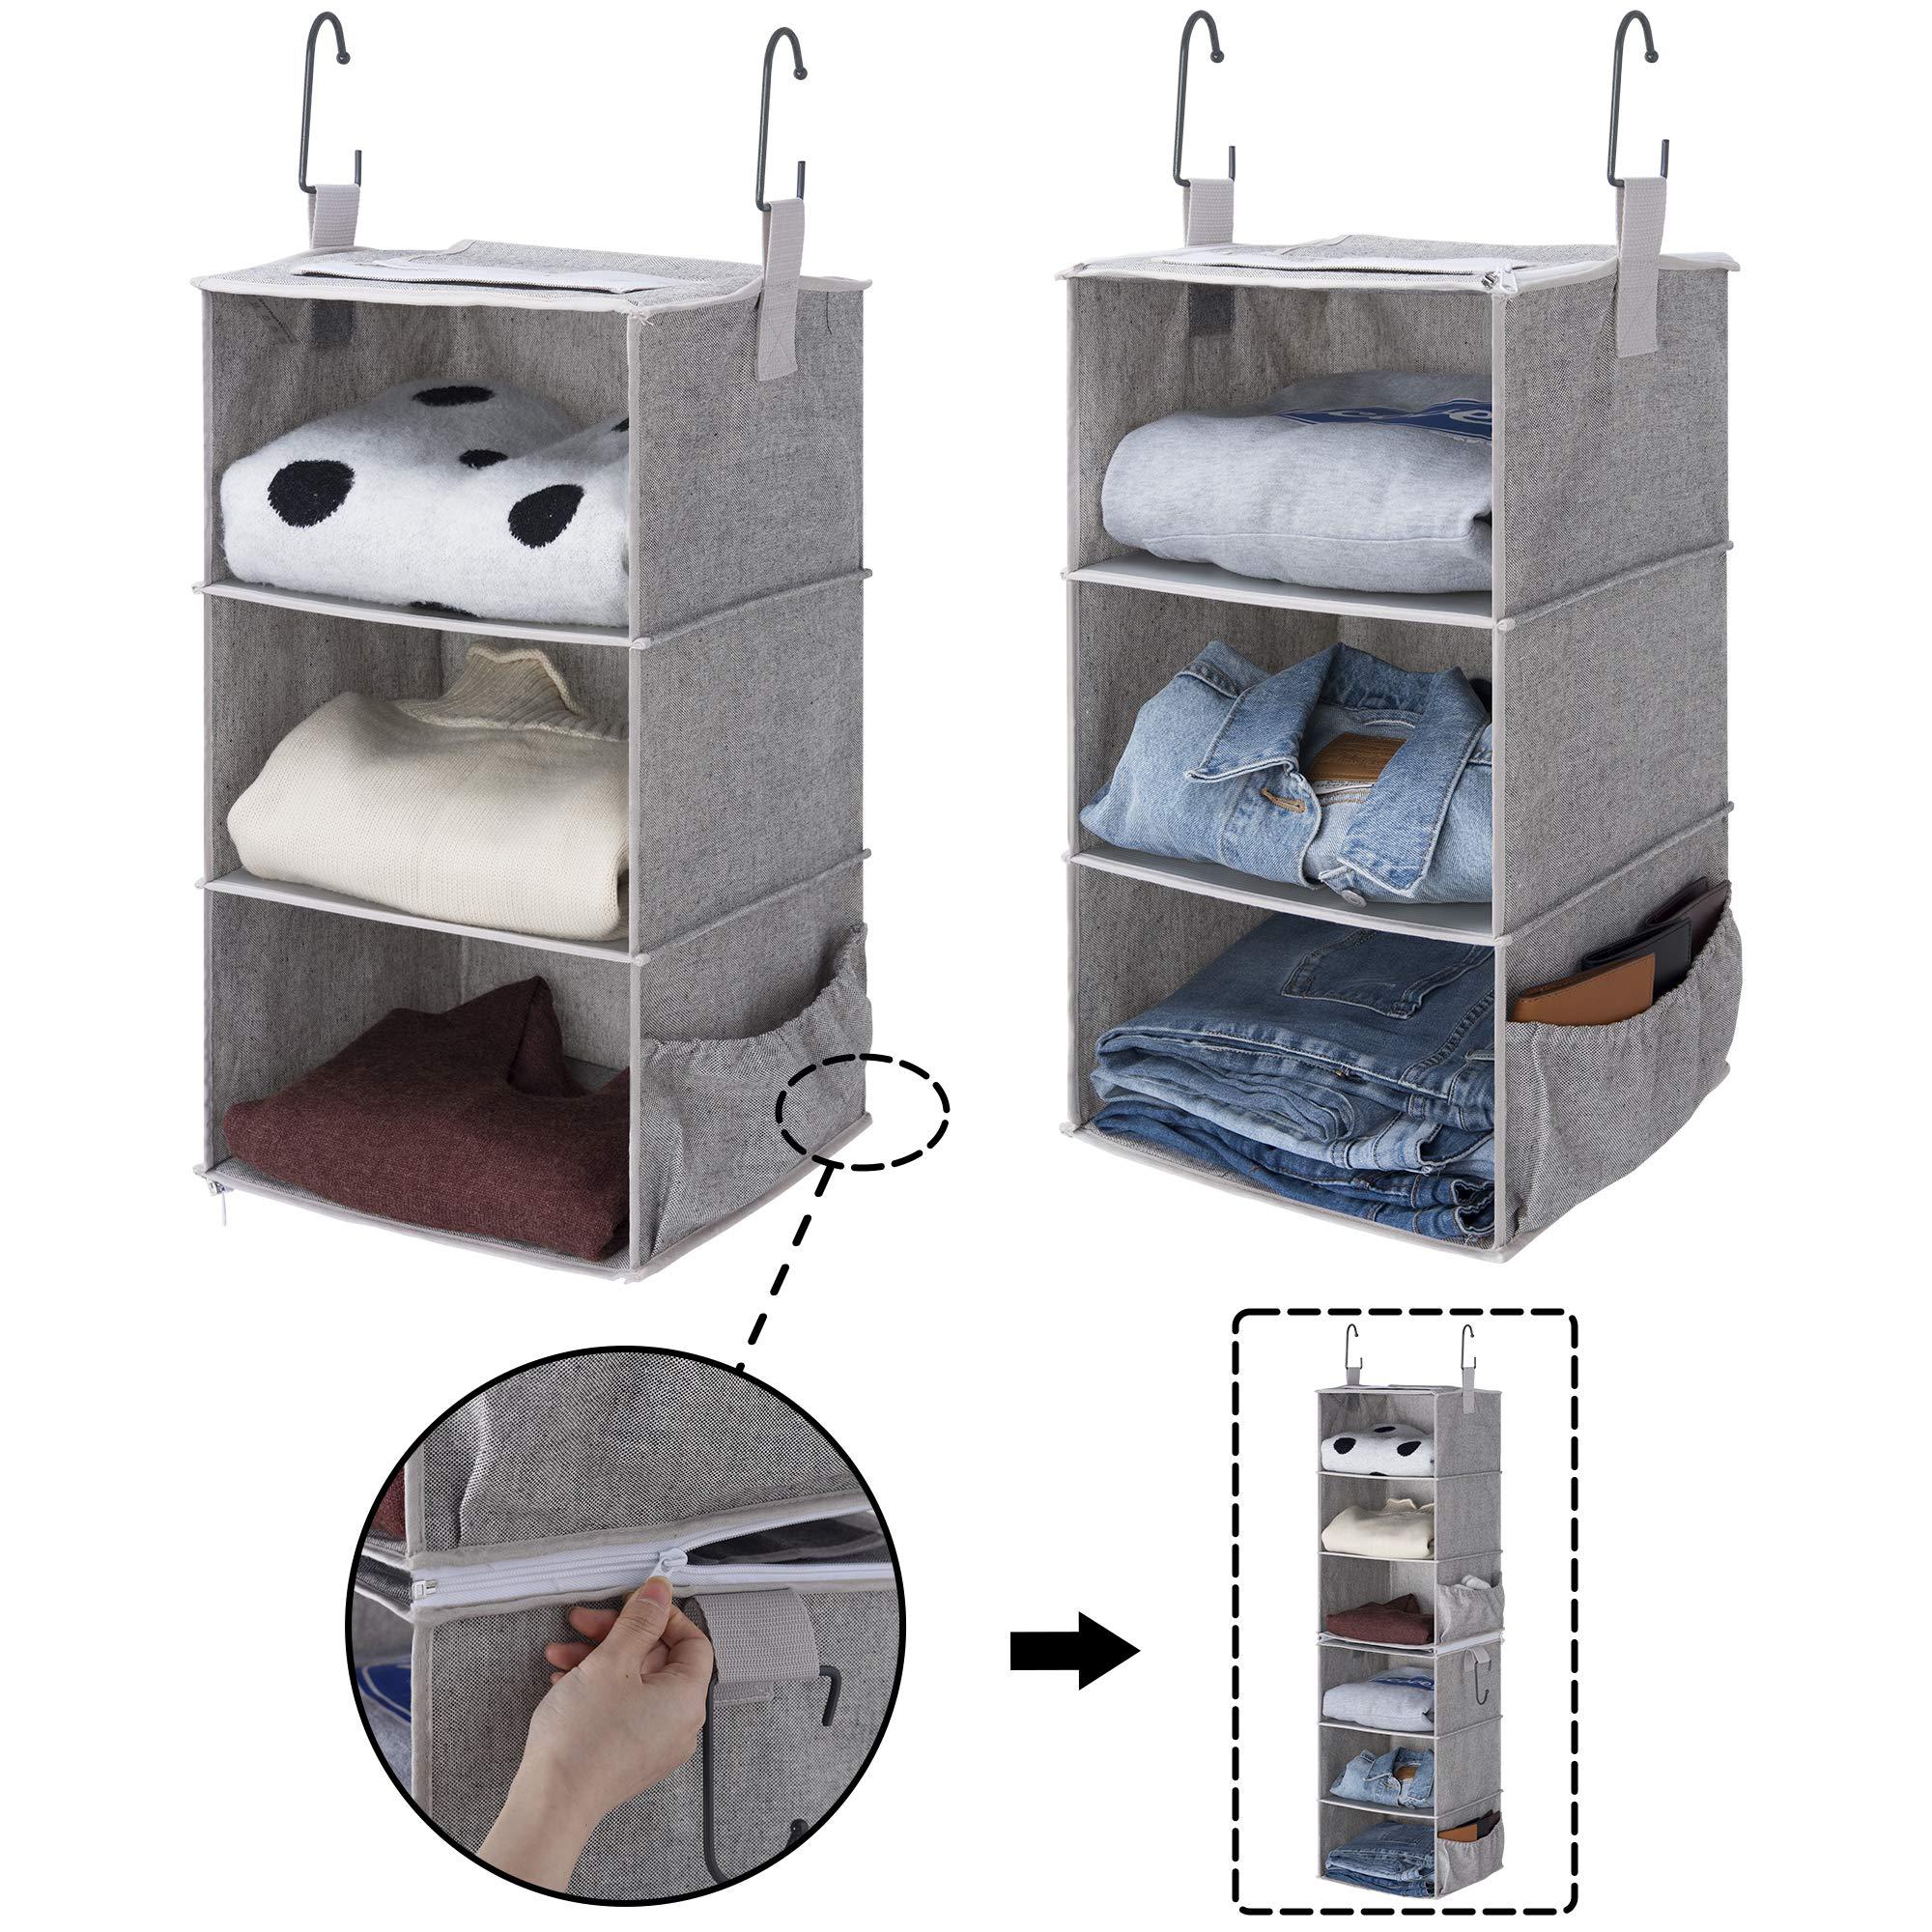 StorageWorks Detachable 3 Shelf Organizers Collapsible